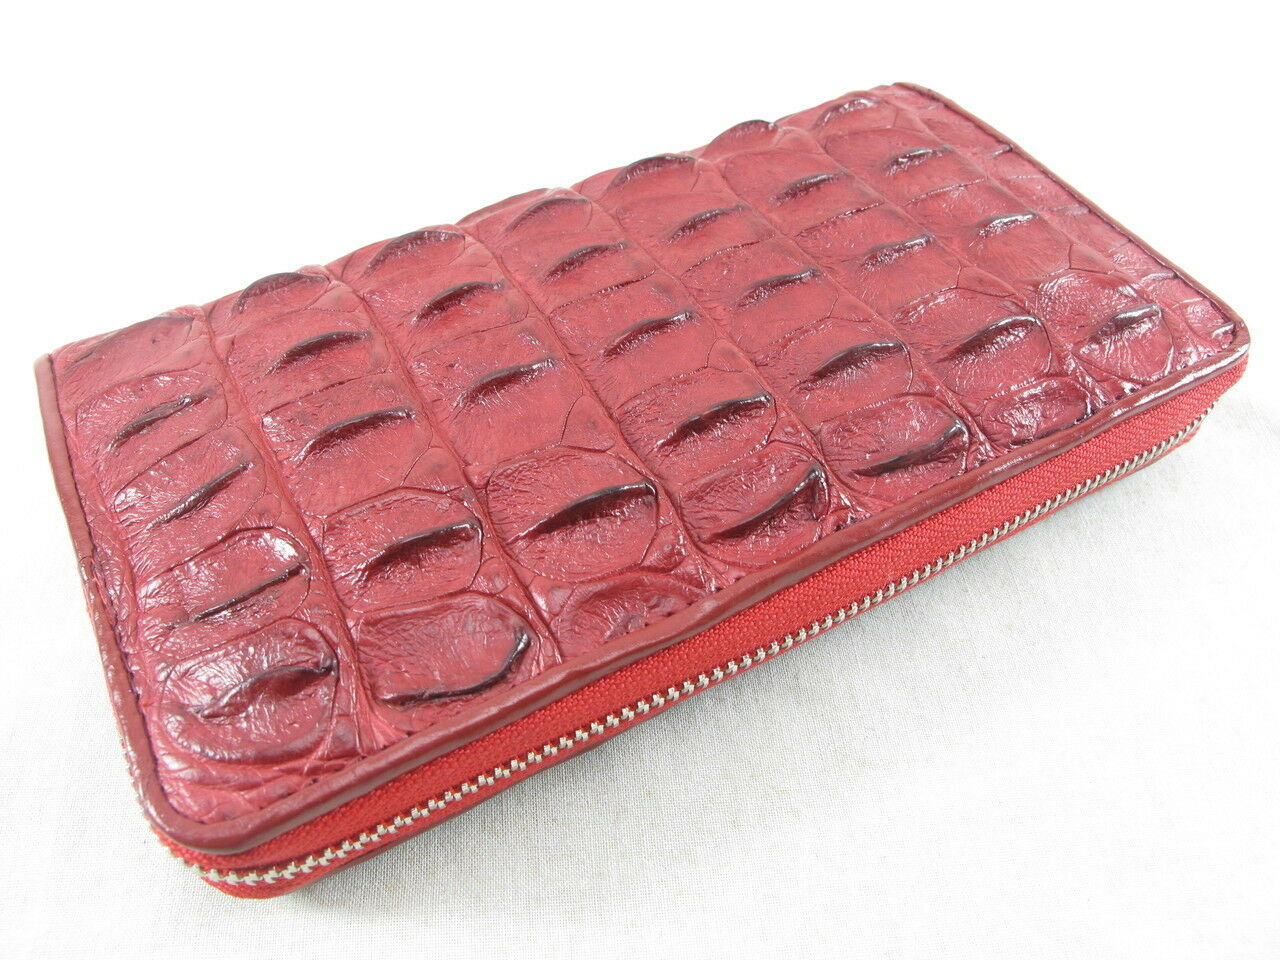 PELGIO Genuine Crocodile Backbone Skin Leather Zip Around Clutch Wallet Burgundy